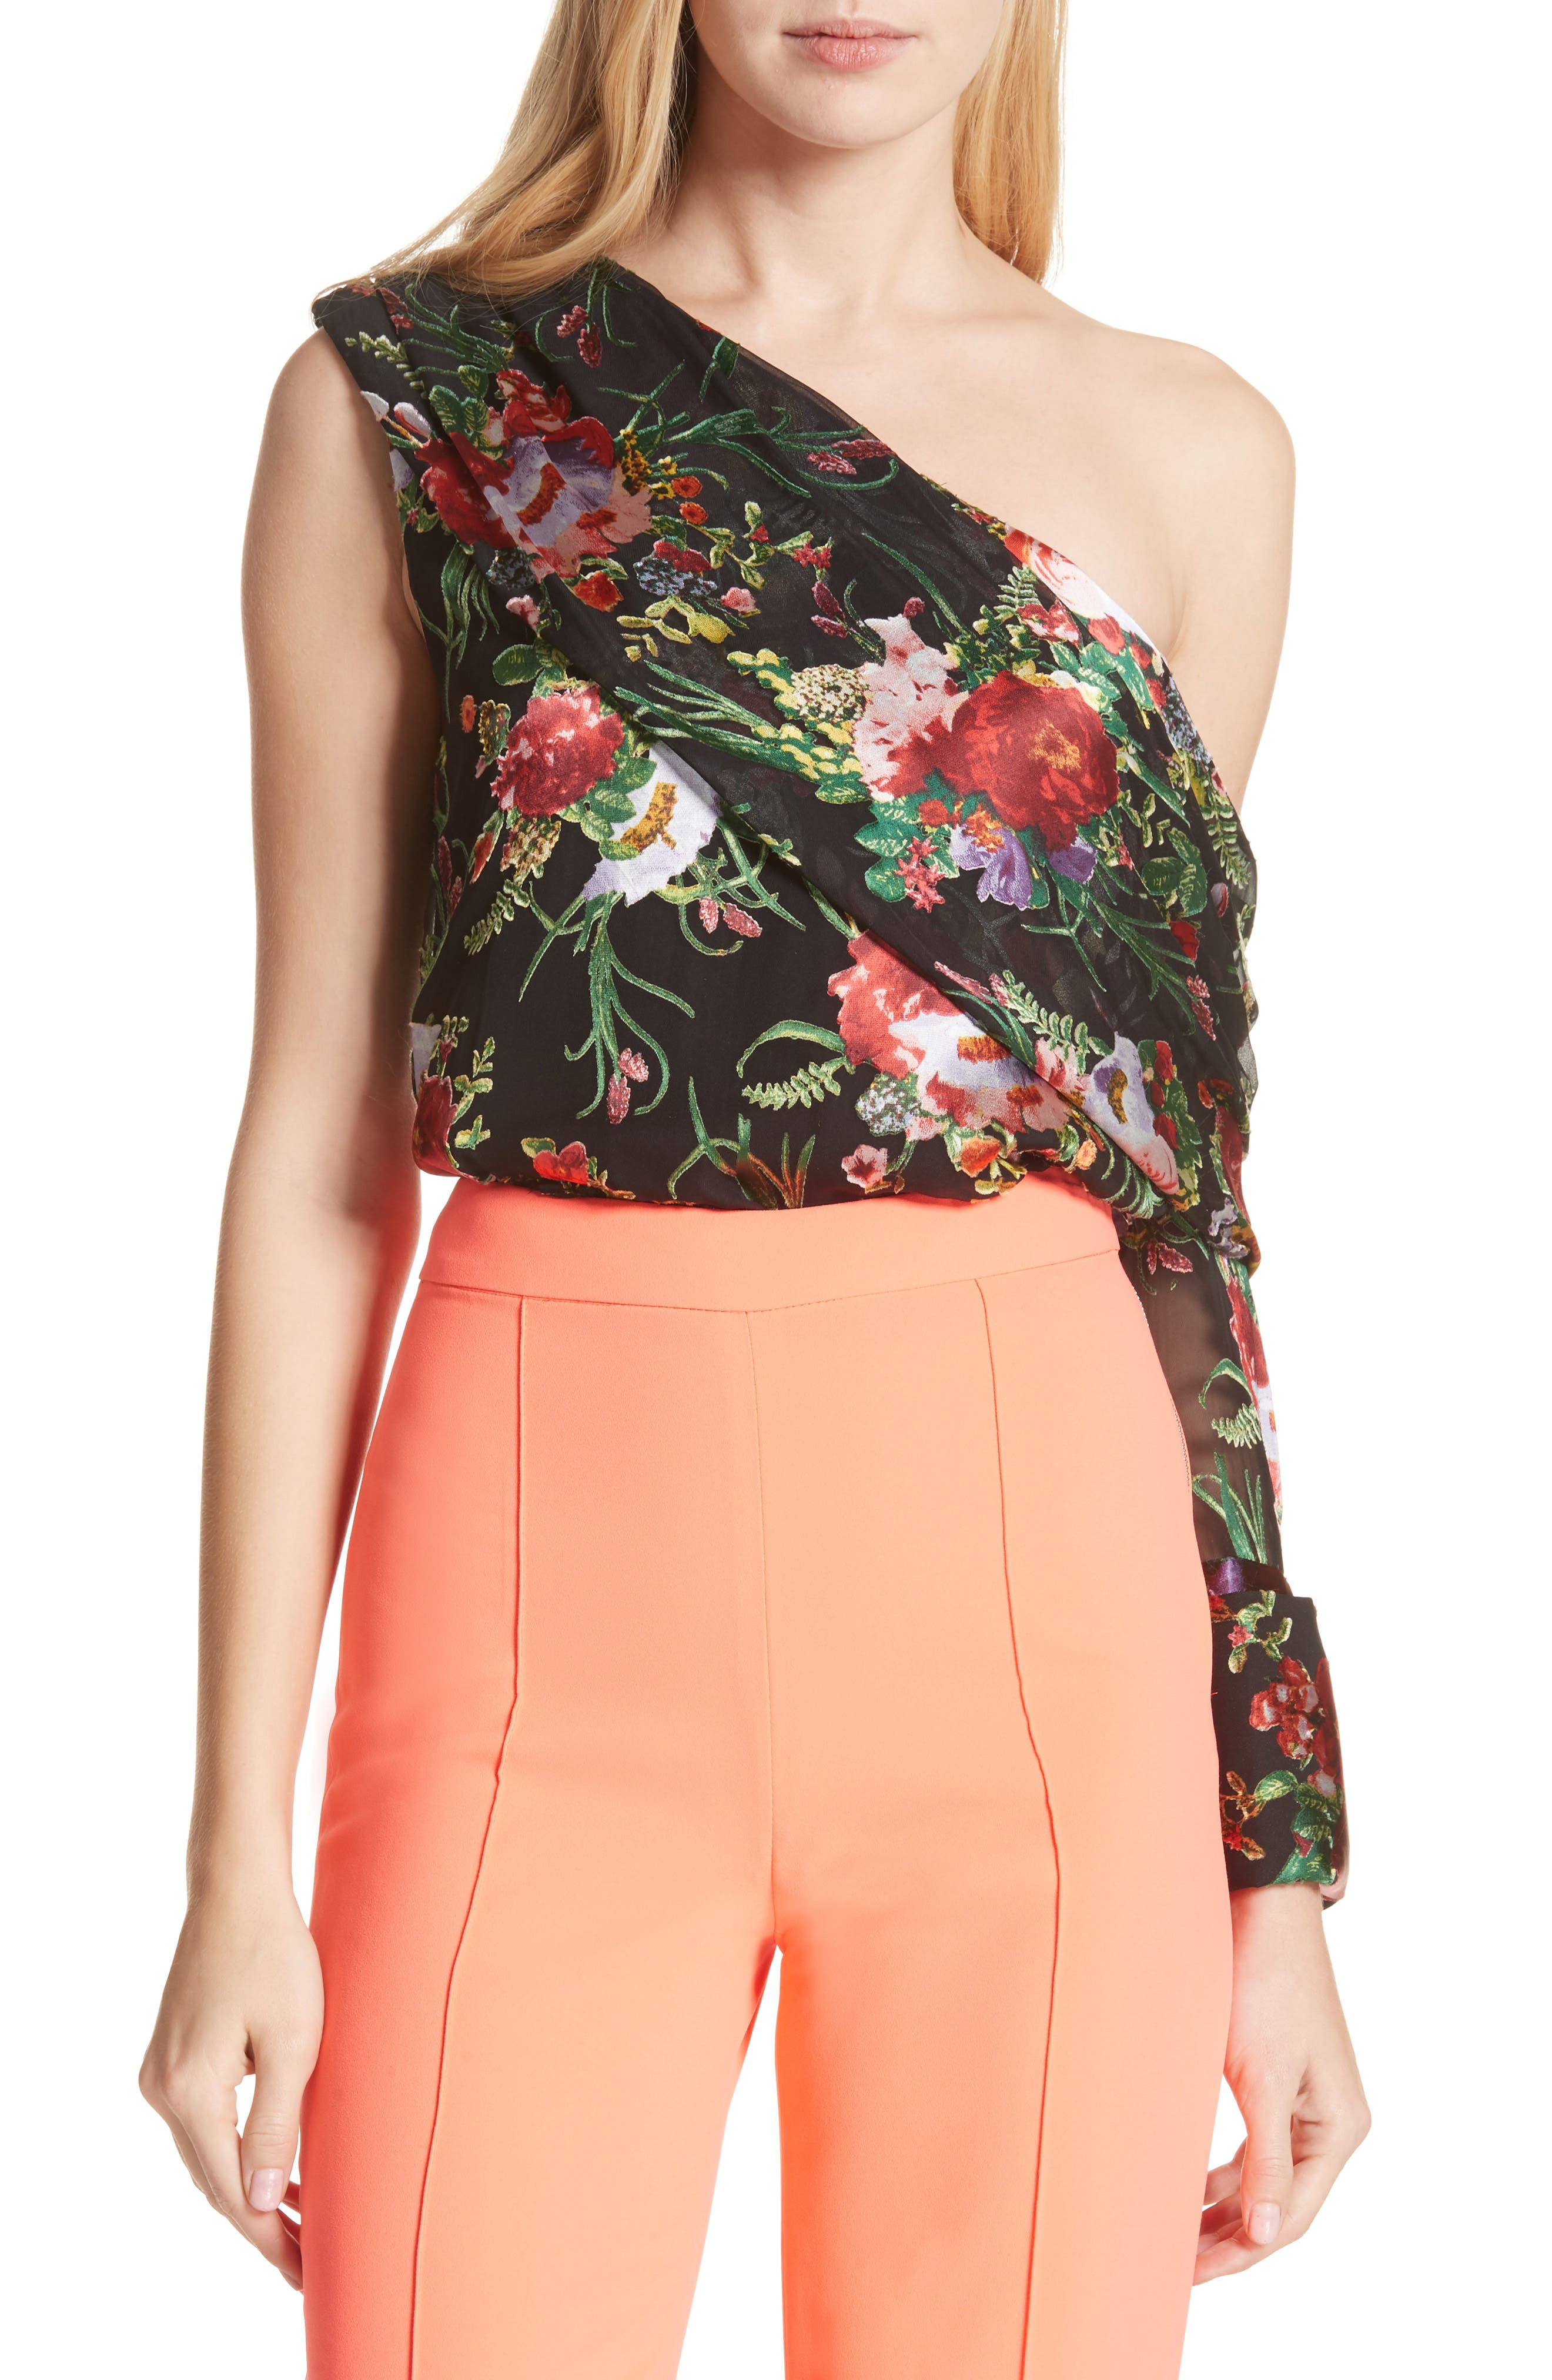 Alice + Olivia Serita One-Shoulder Floral Top